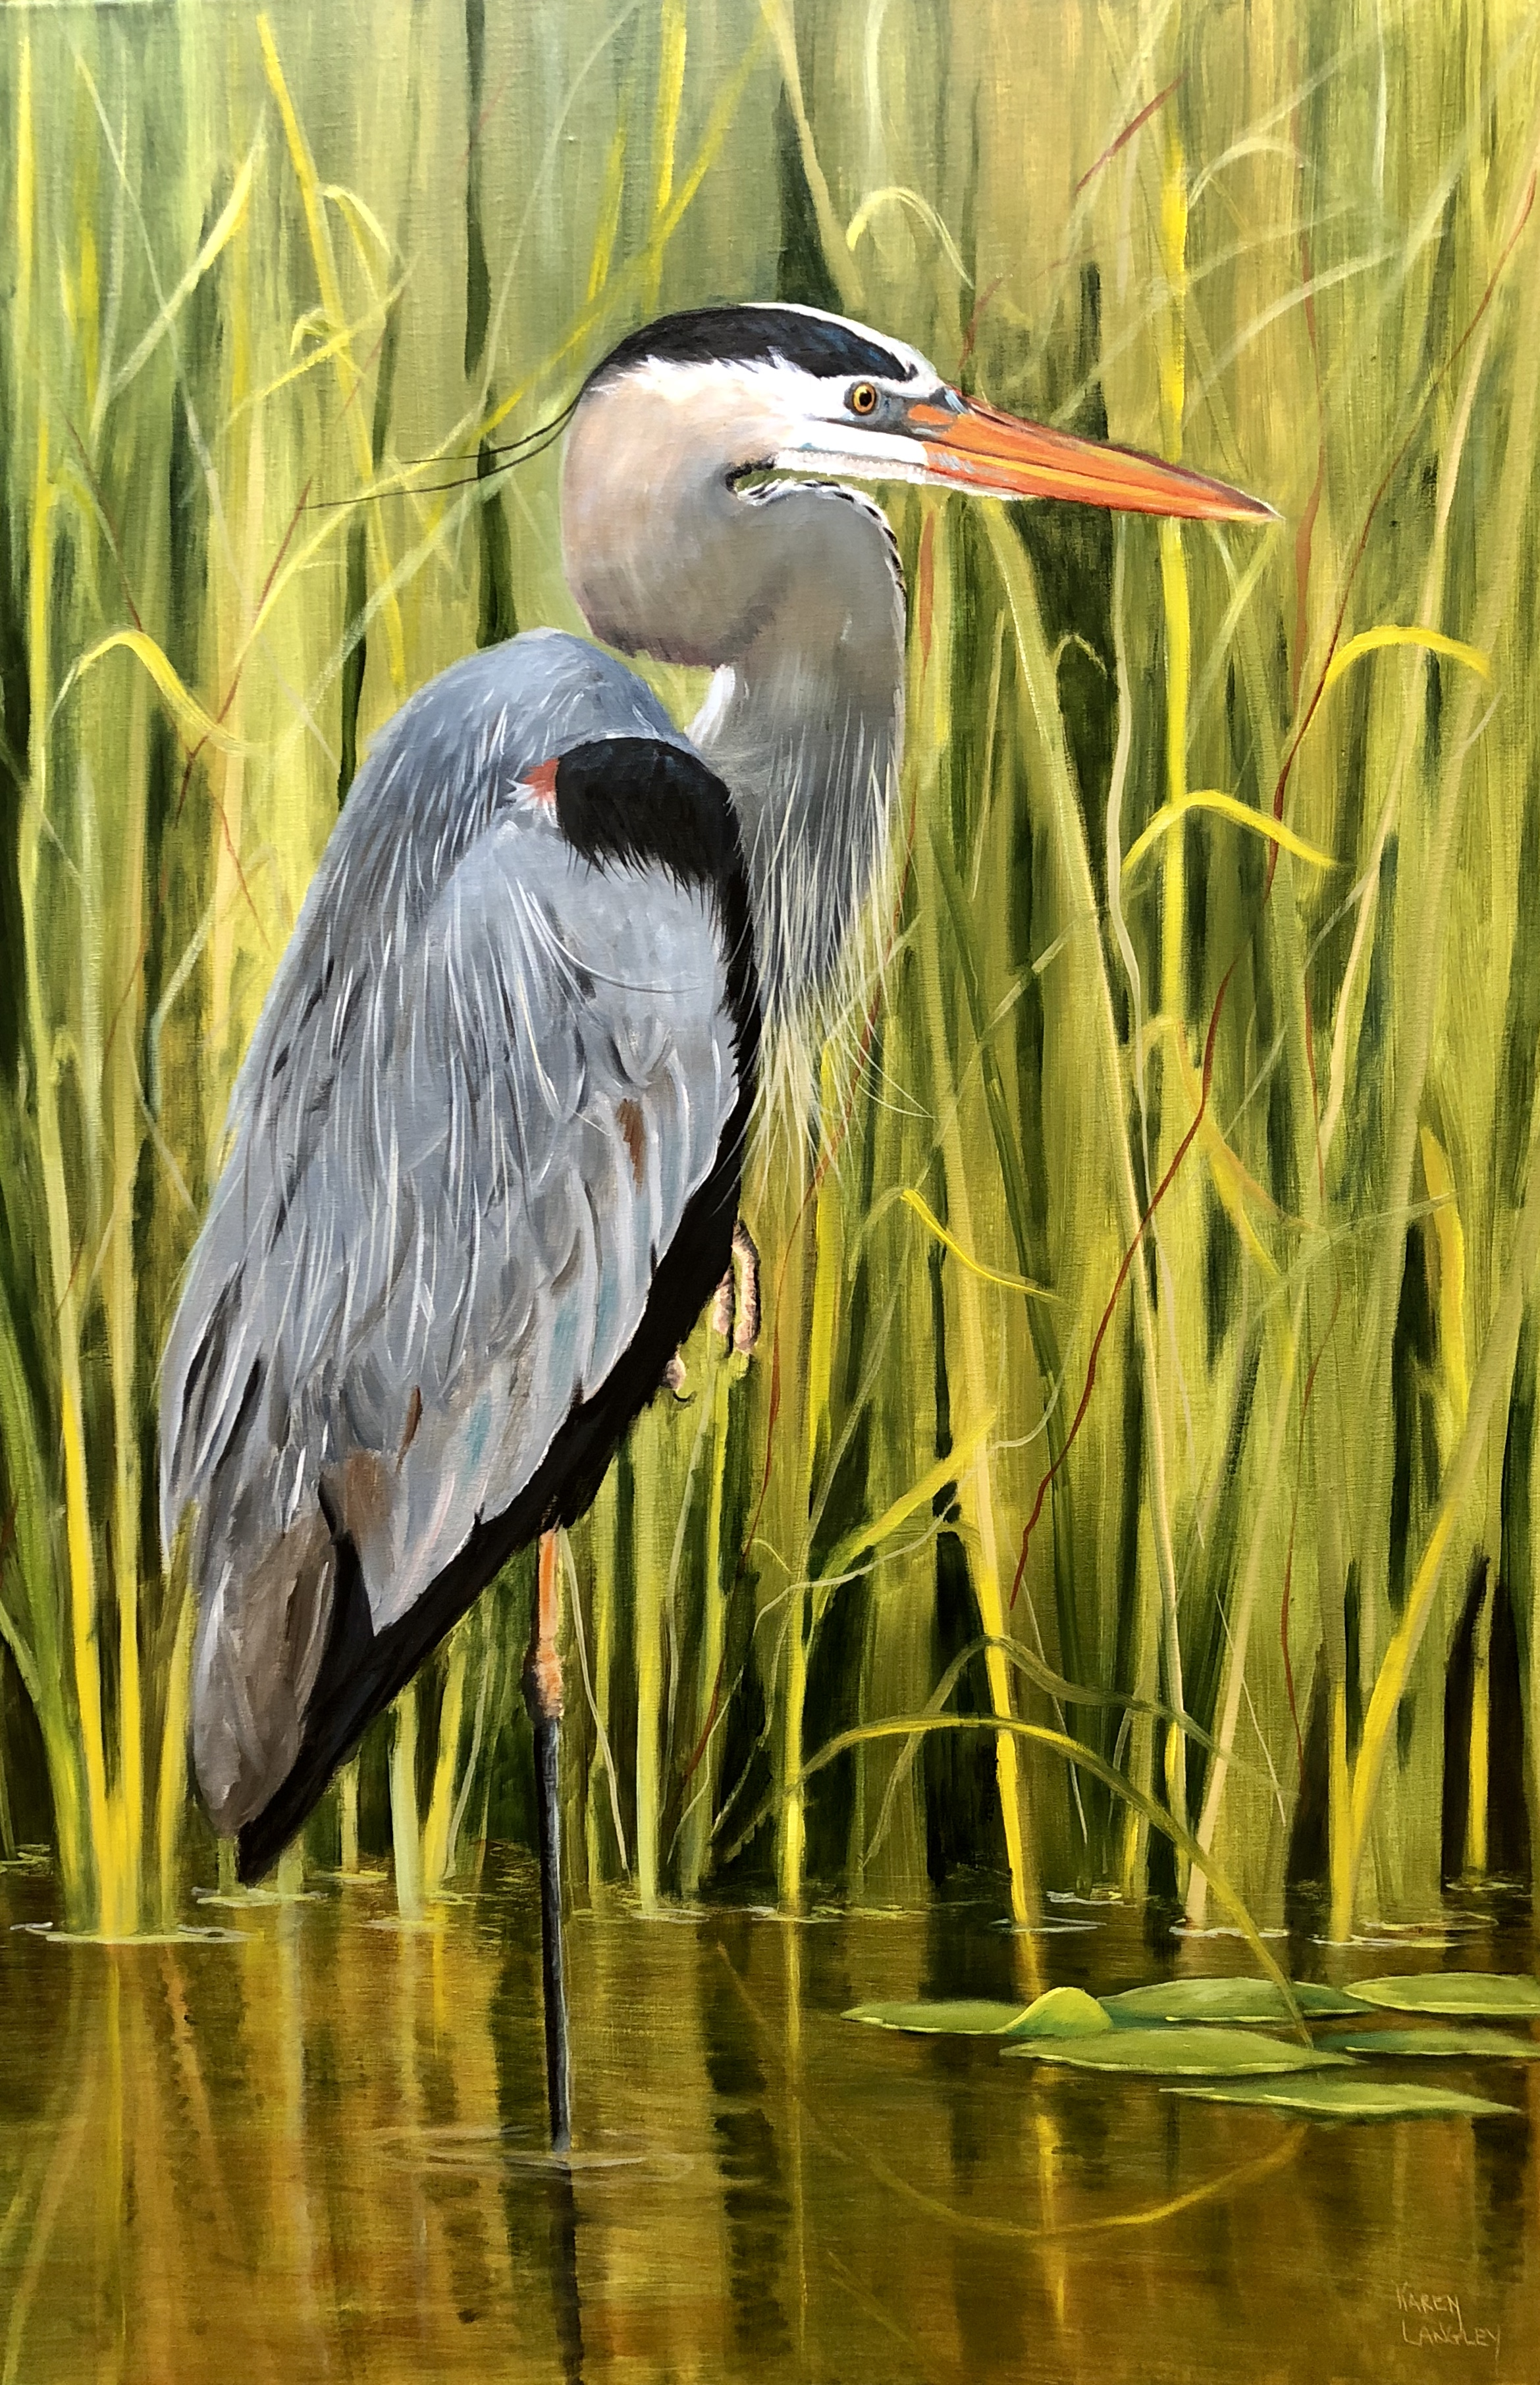 Day Dreaming in the Marsh 1  Oil on Linen 24x36